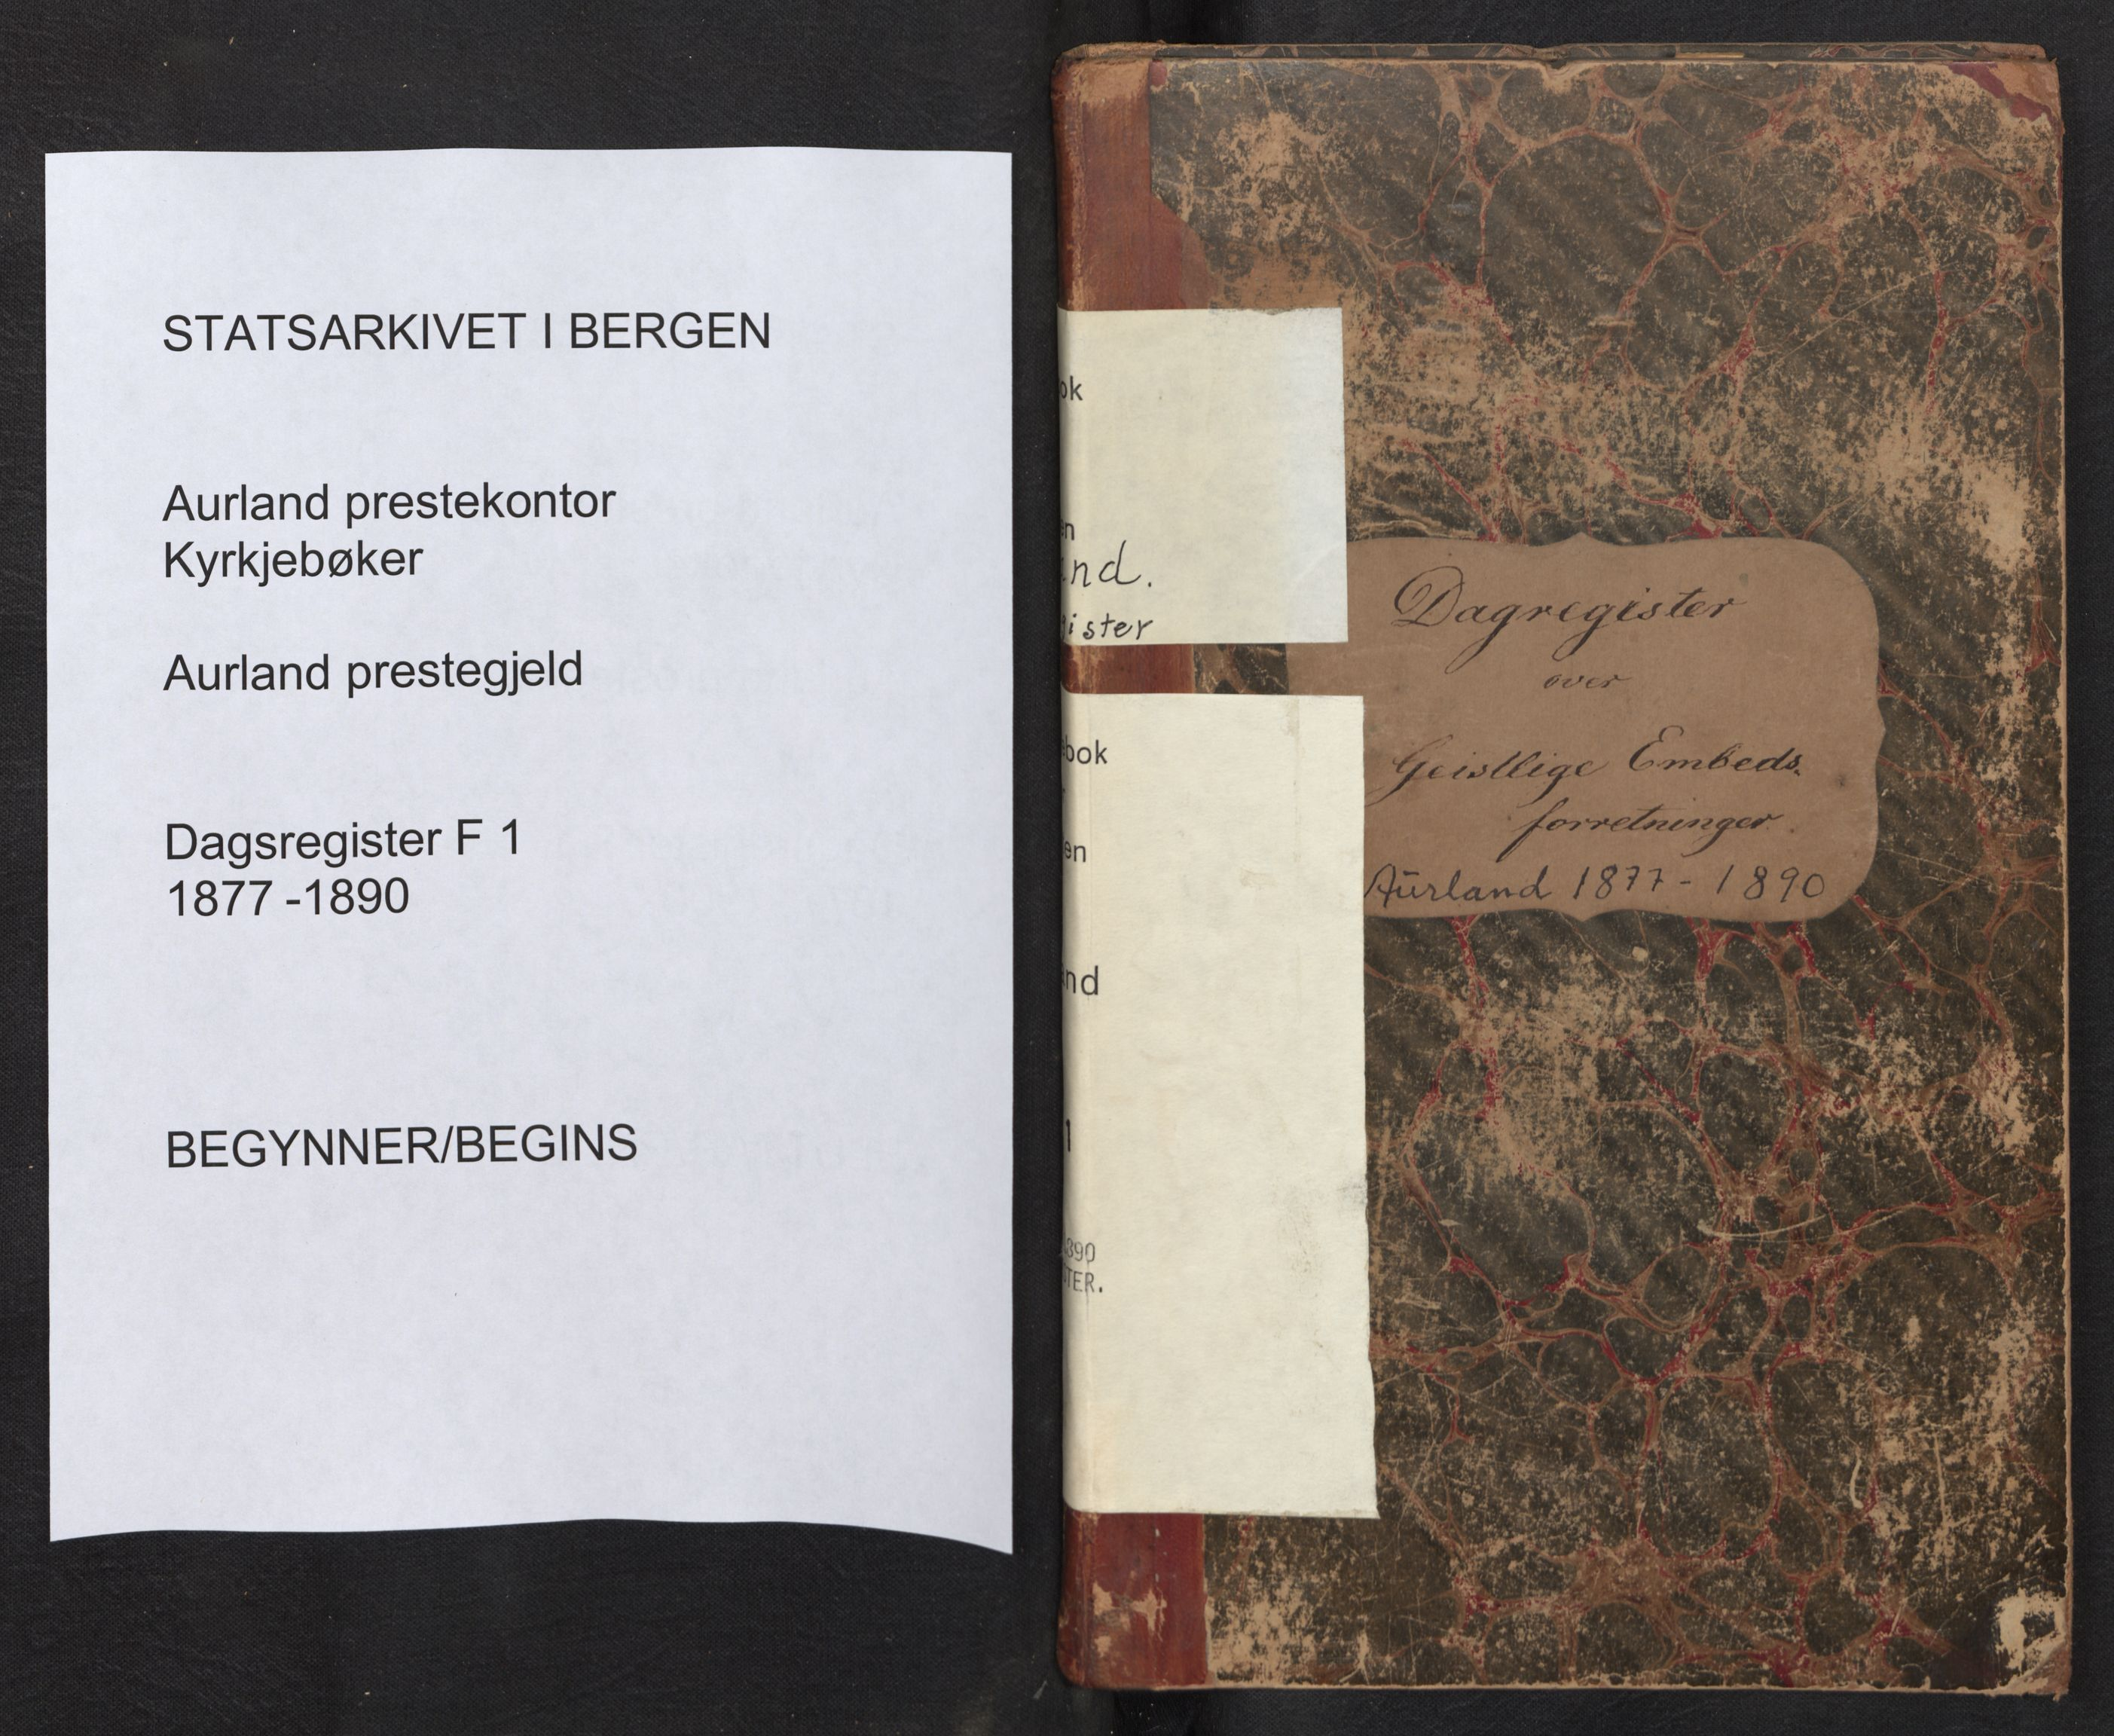 SAB, Aurland Sokneprestembete*, Diary records no. F 1, 1877-1890